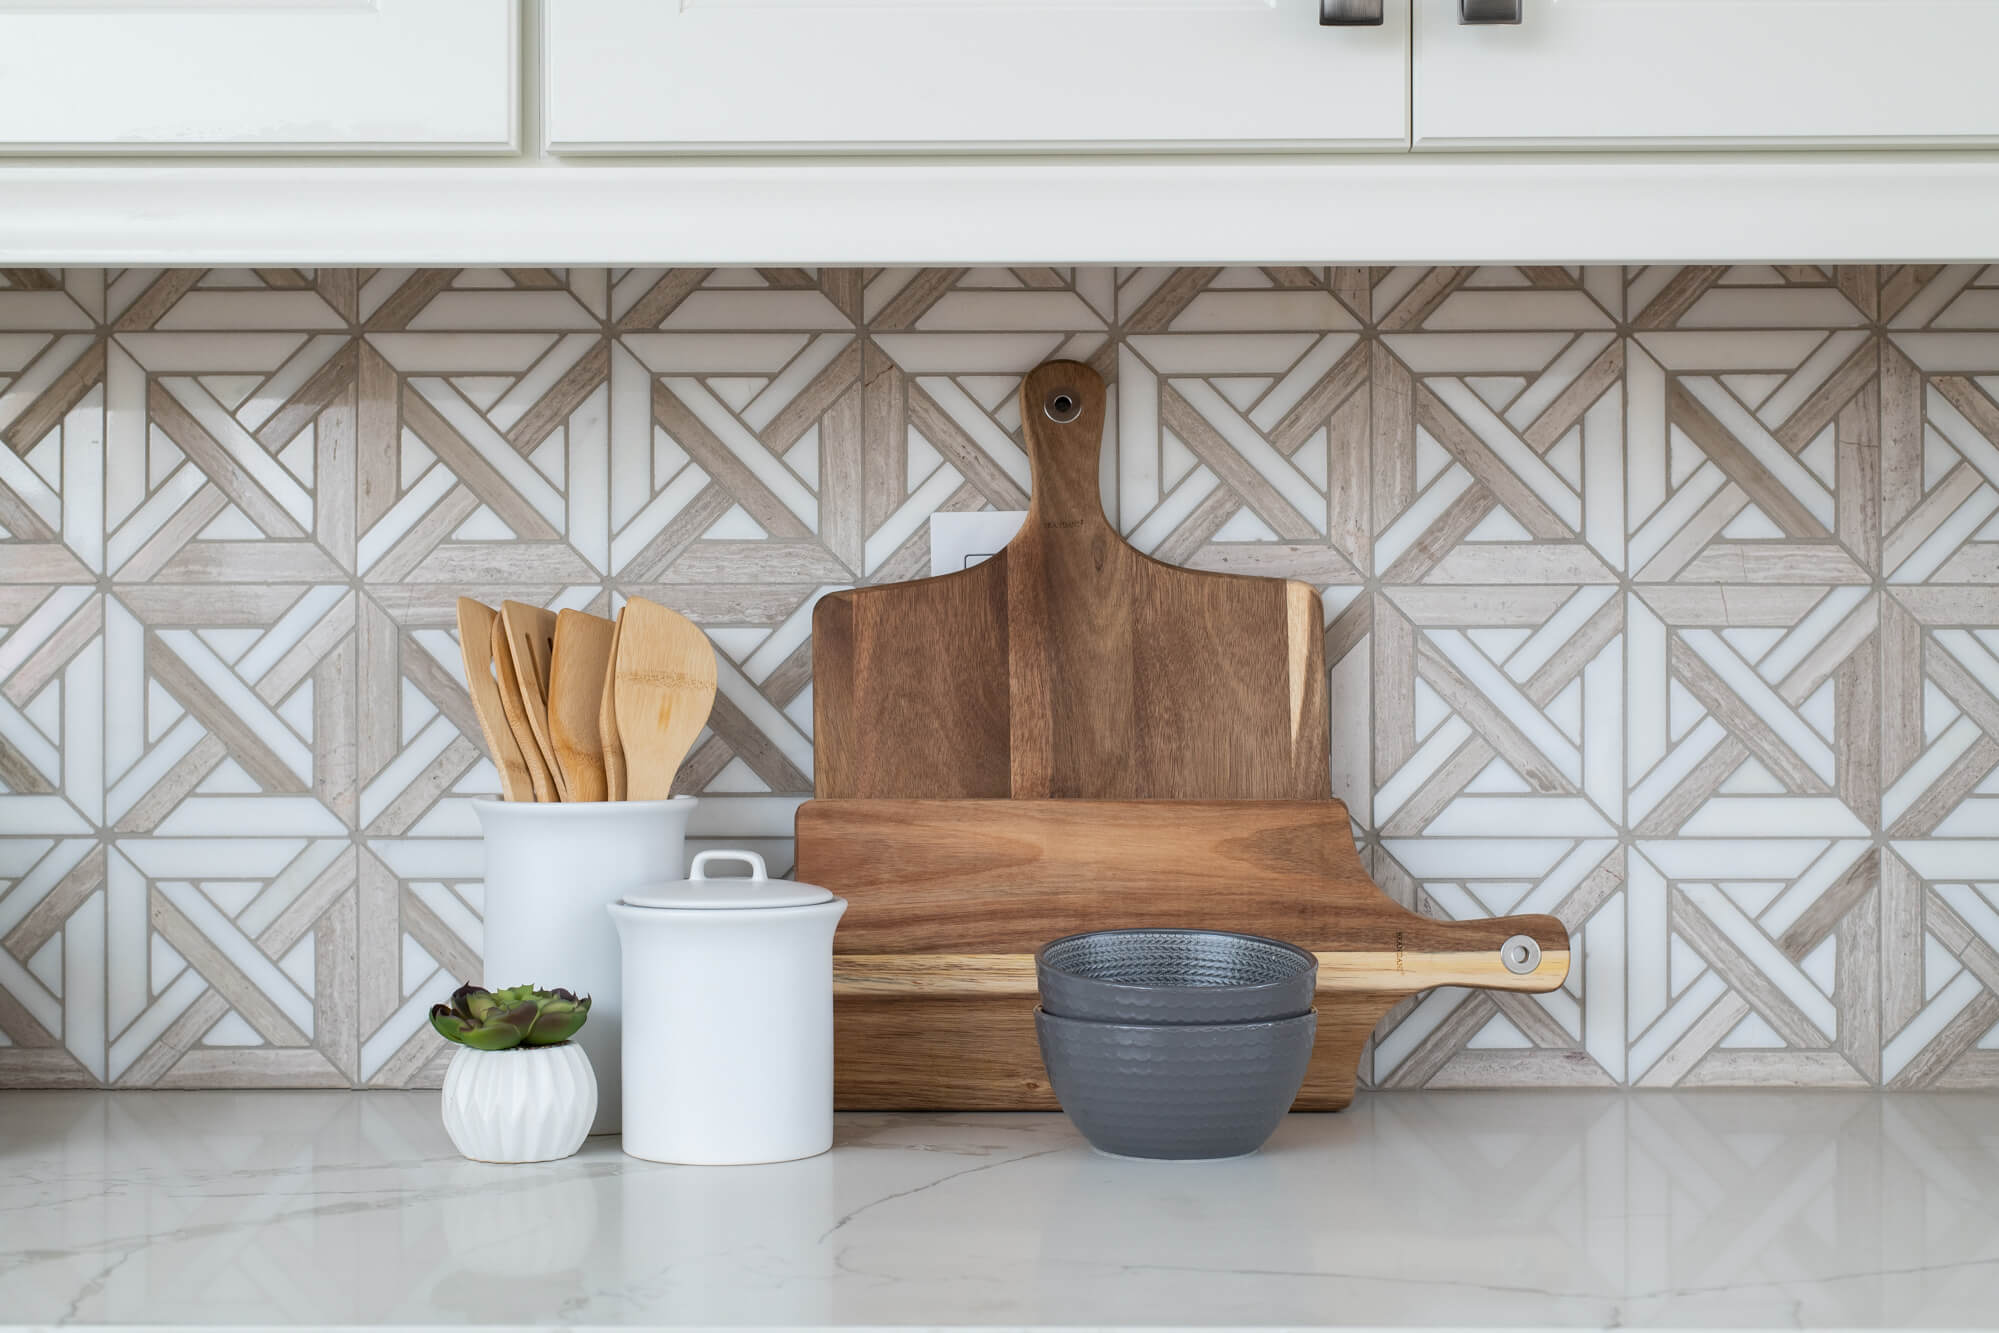 Marble Mosaic Tile Backsplash With Geometric Design in Kitchen Remodel